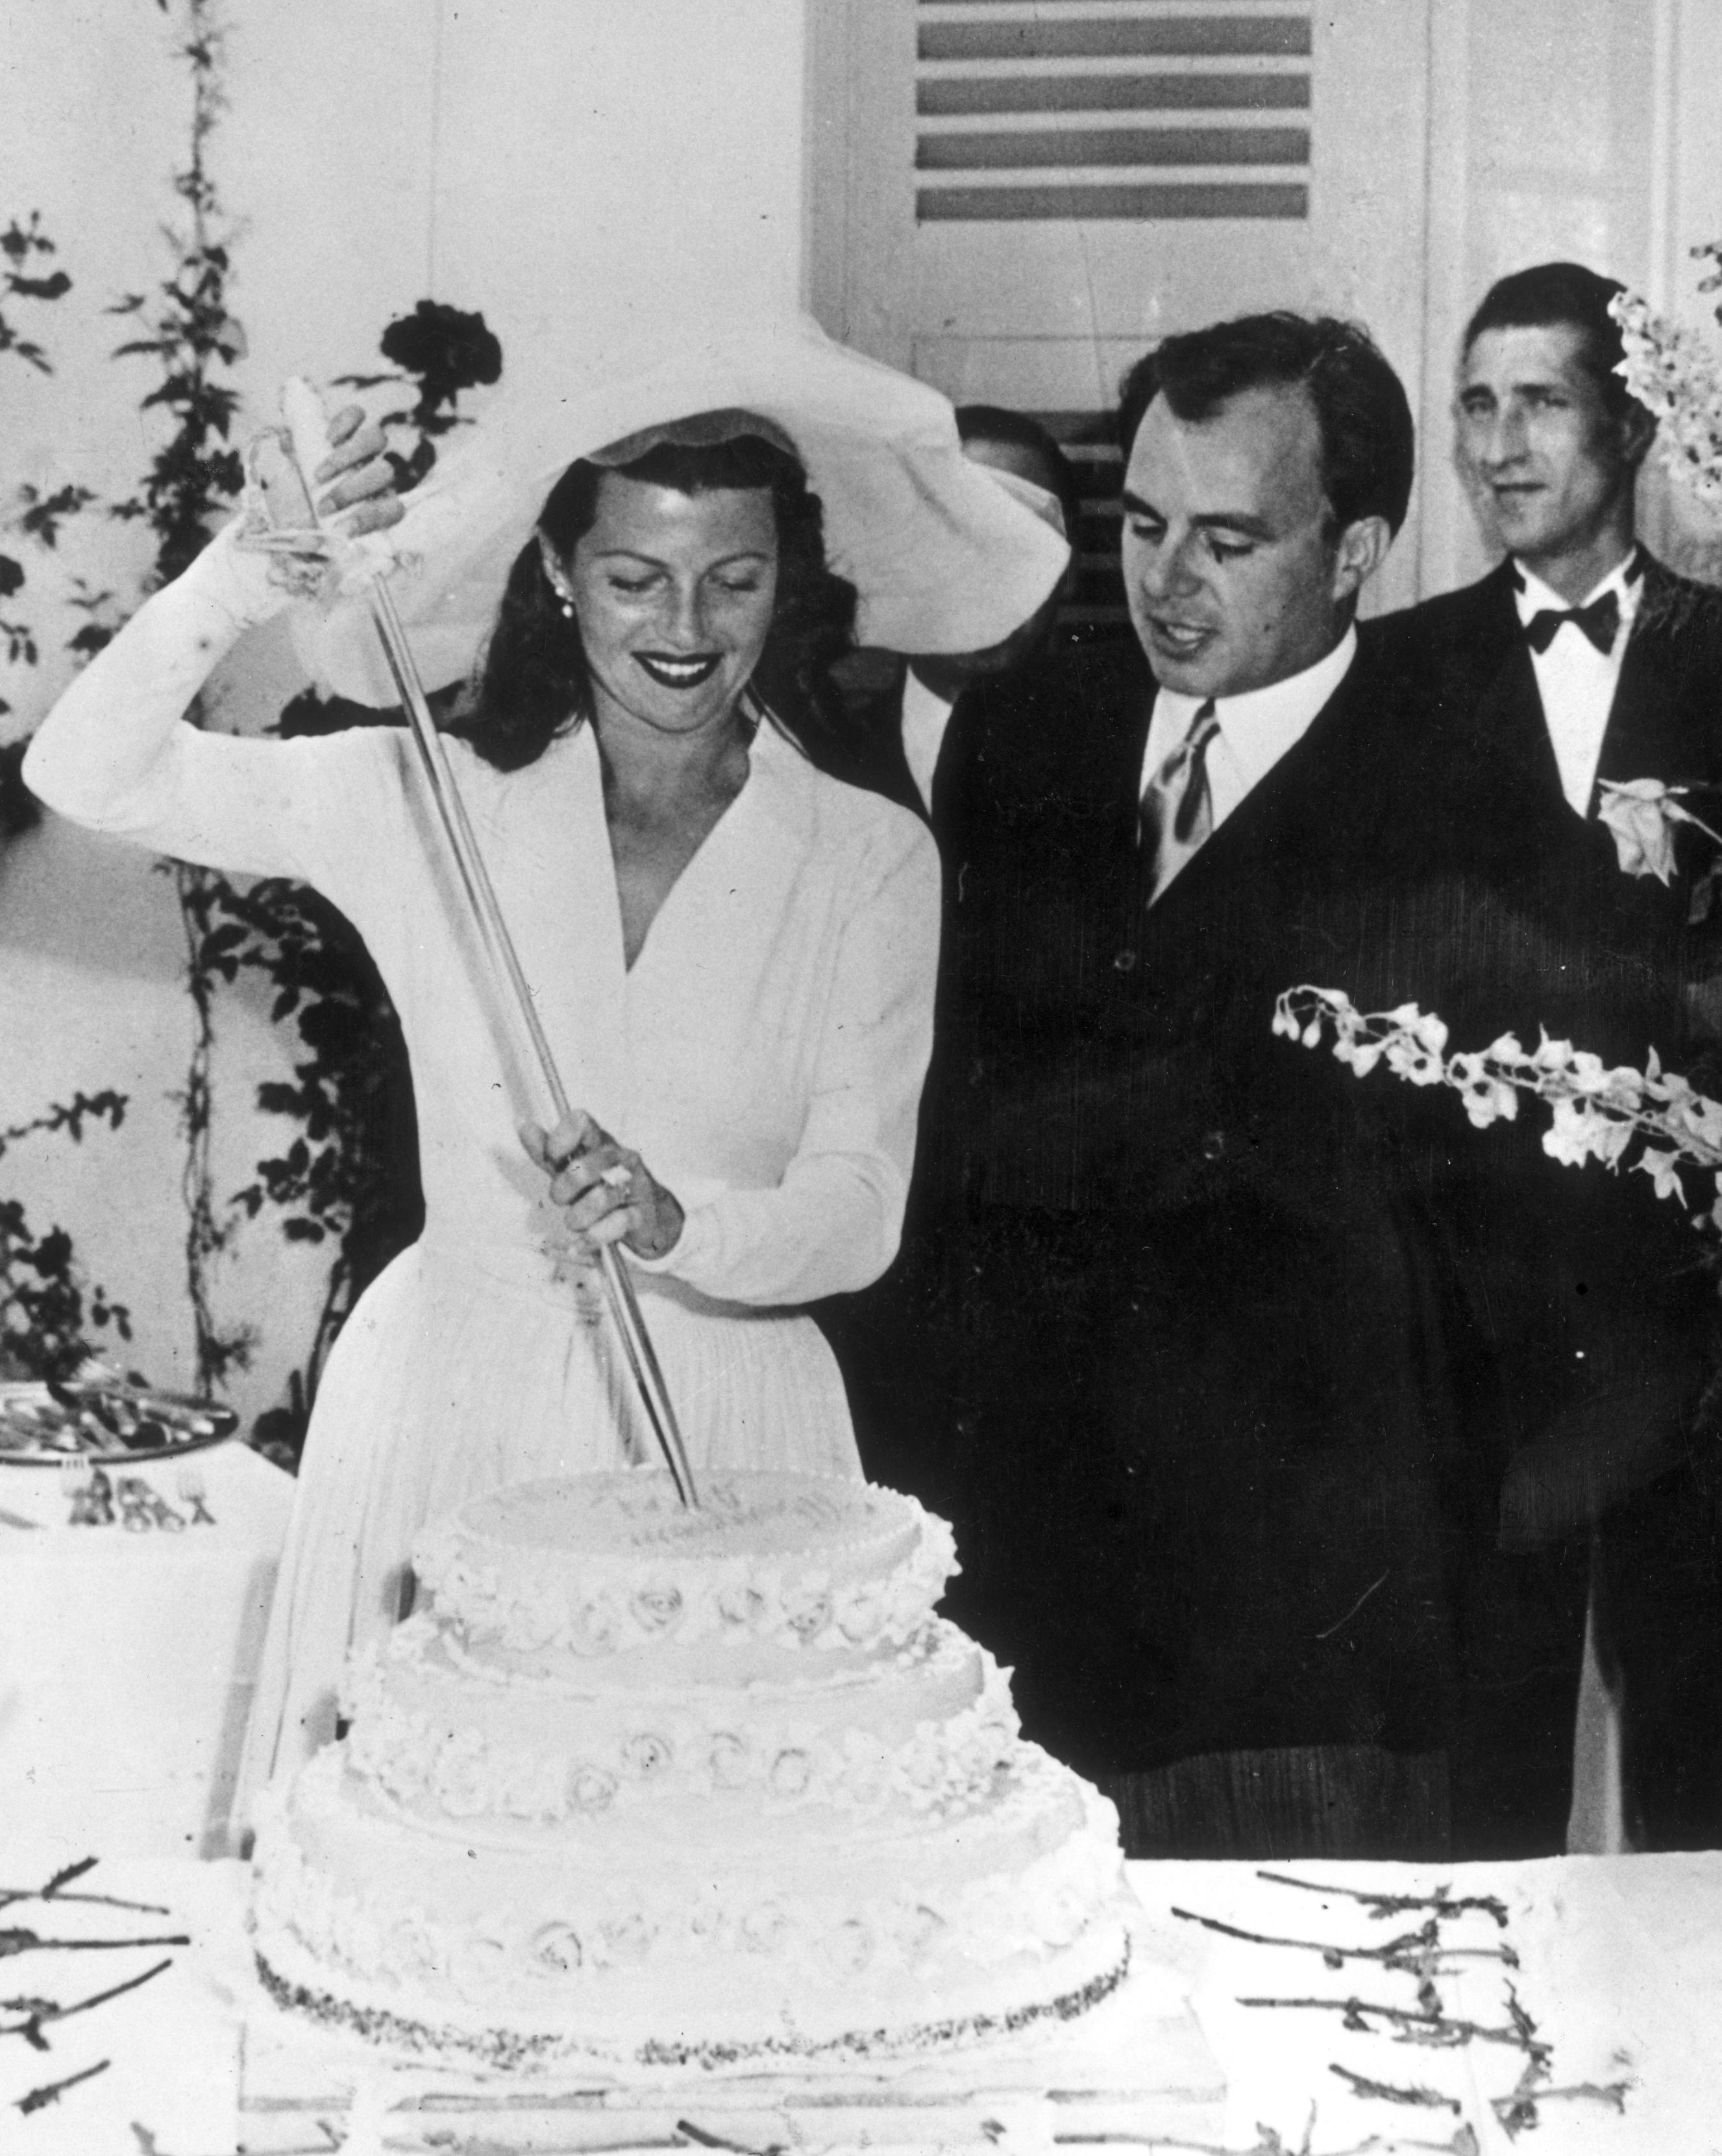 celebrity-vintage-wedding-cakes-rita-hayworth-3136533-1015.jpg